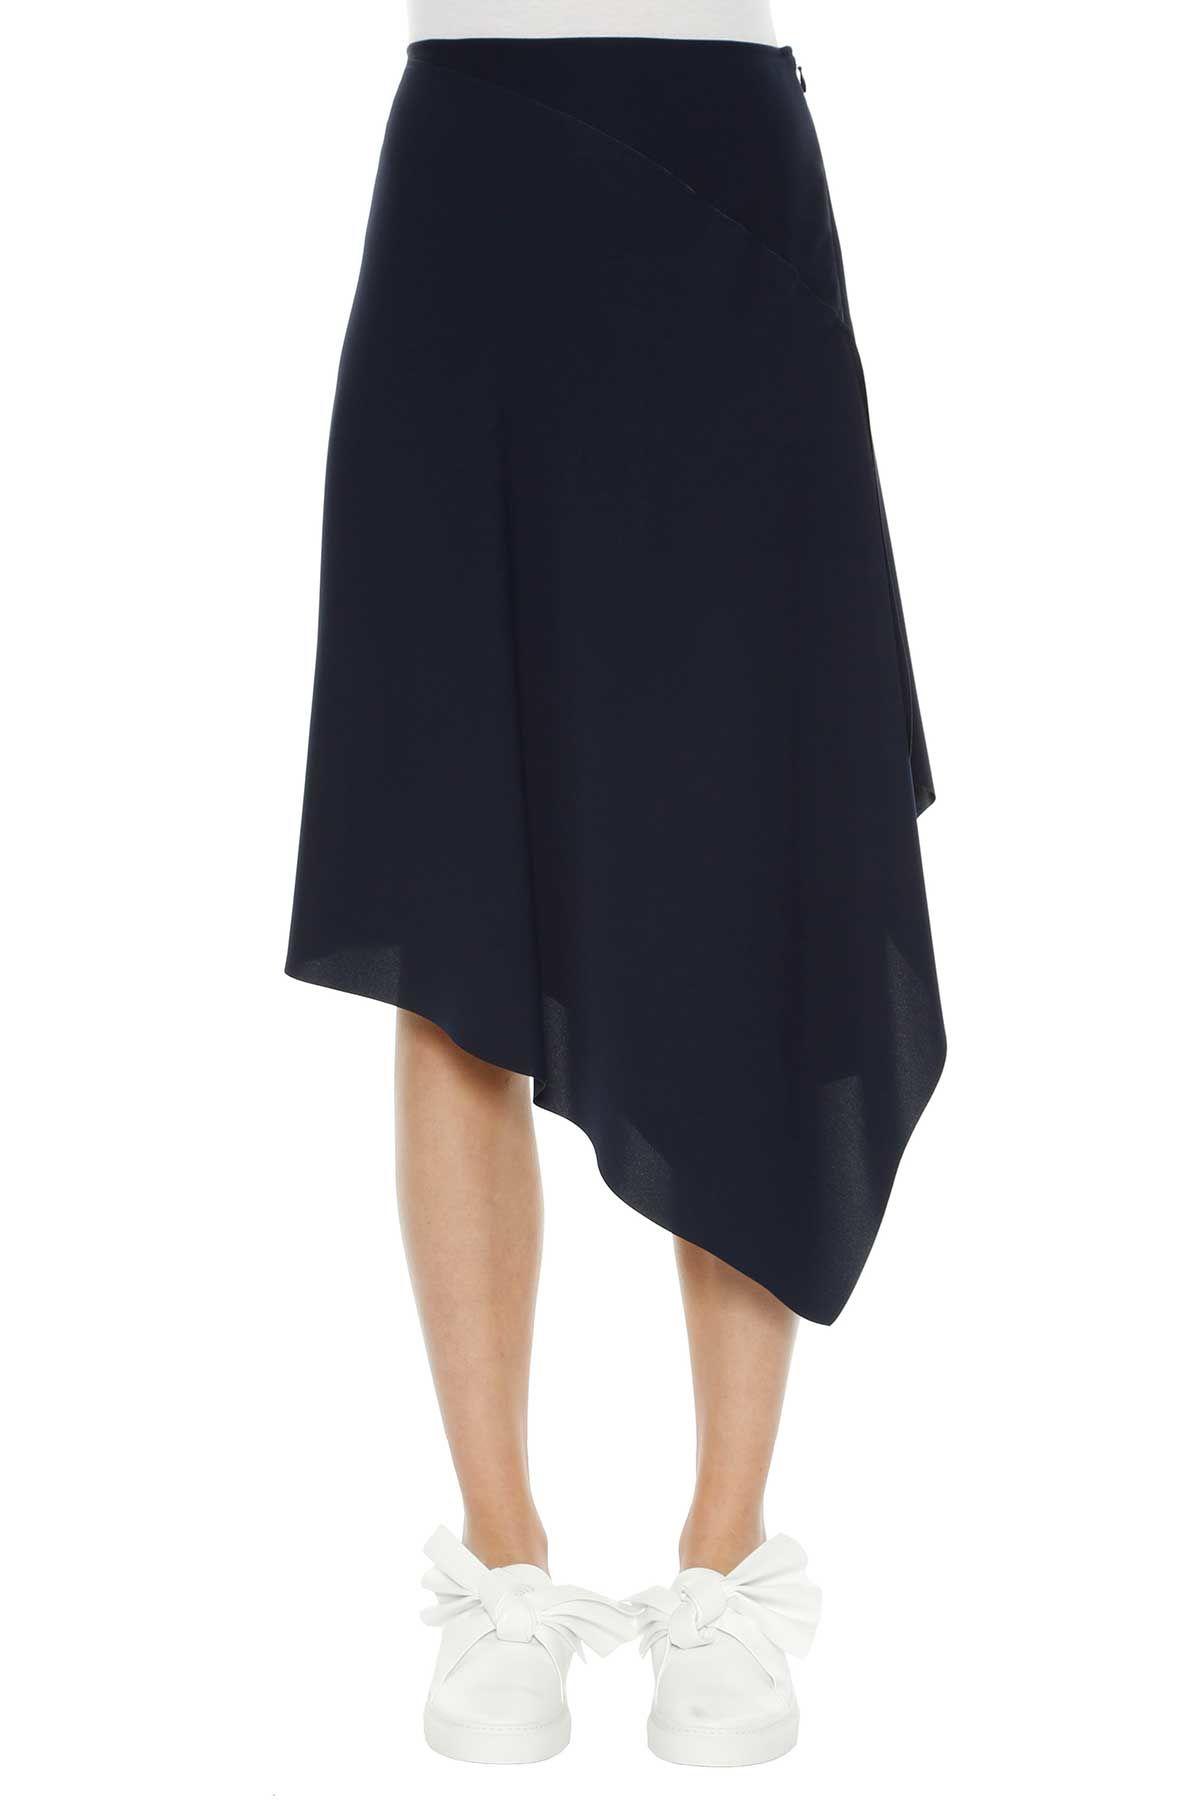 Cedric Charlier Asymmetric Midi Skirt